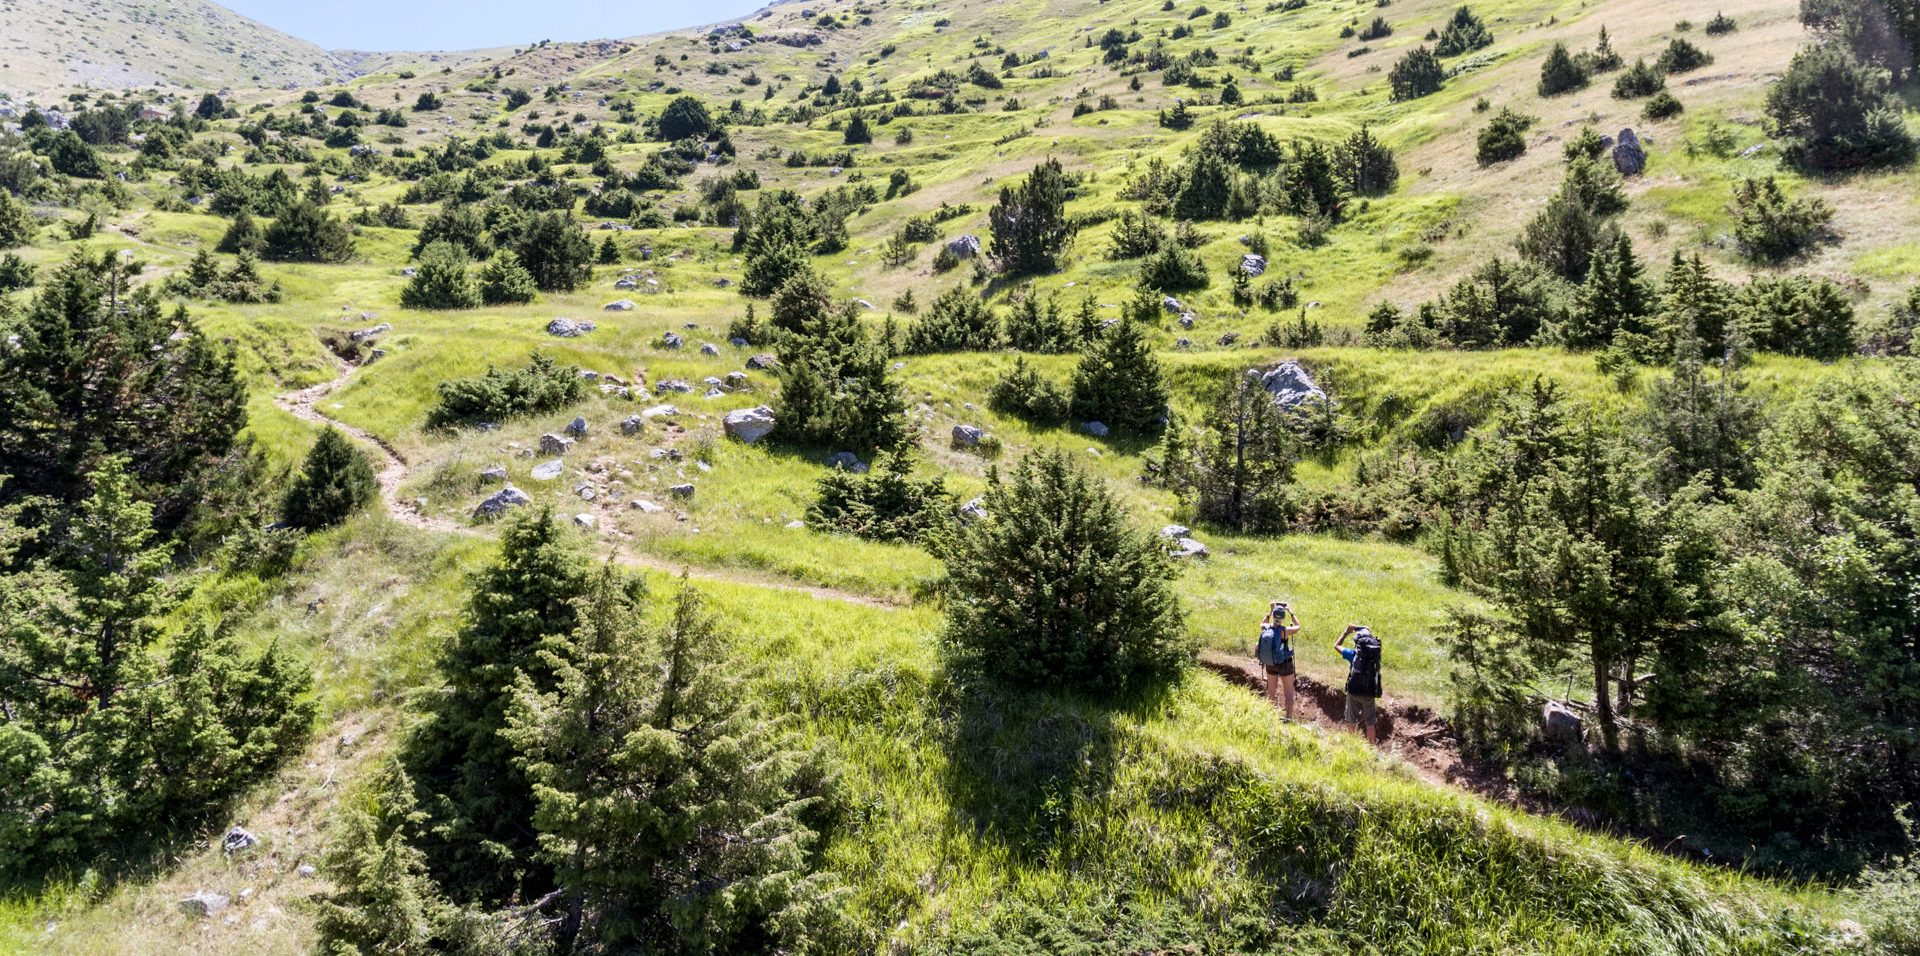 Stroll Through The Nature Of Epirus On The Alpine Dragonlake Hiking Tour From Papigko Village - Ioannina_94